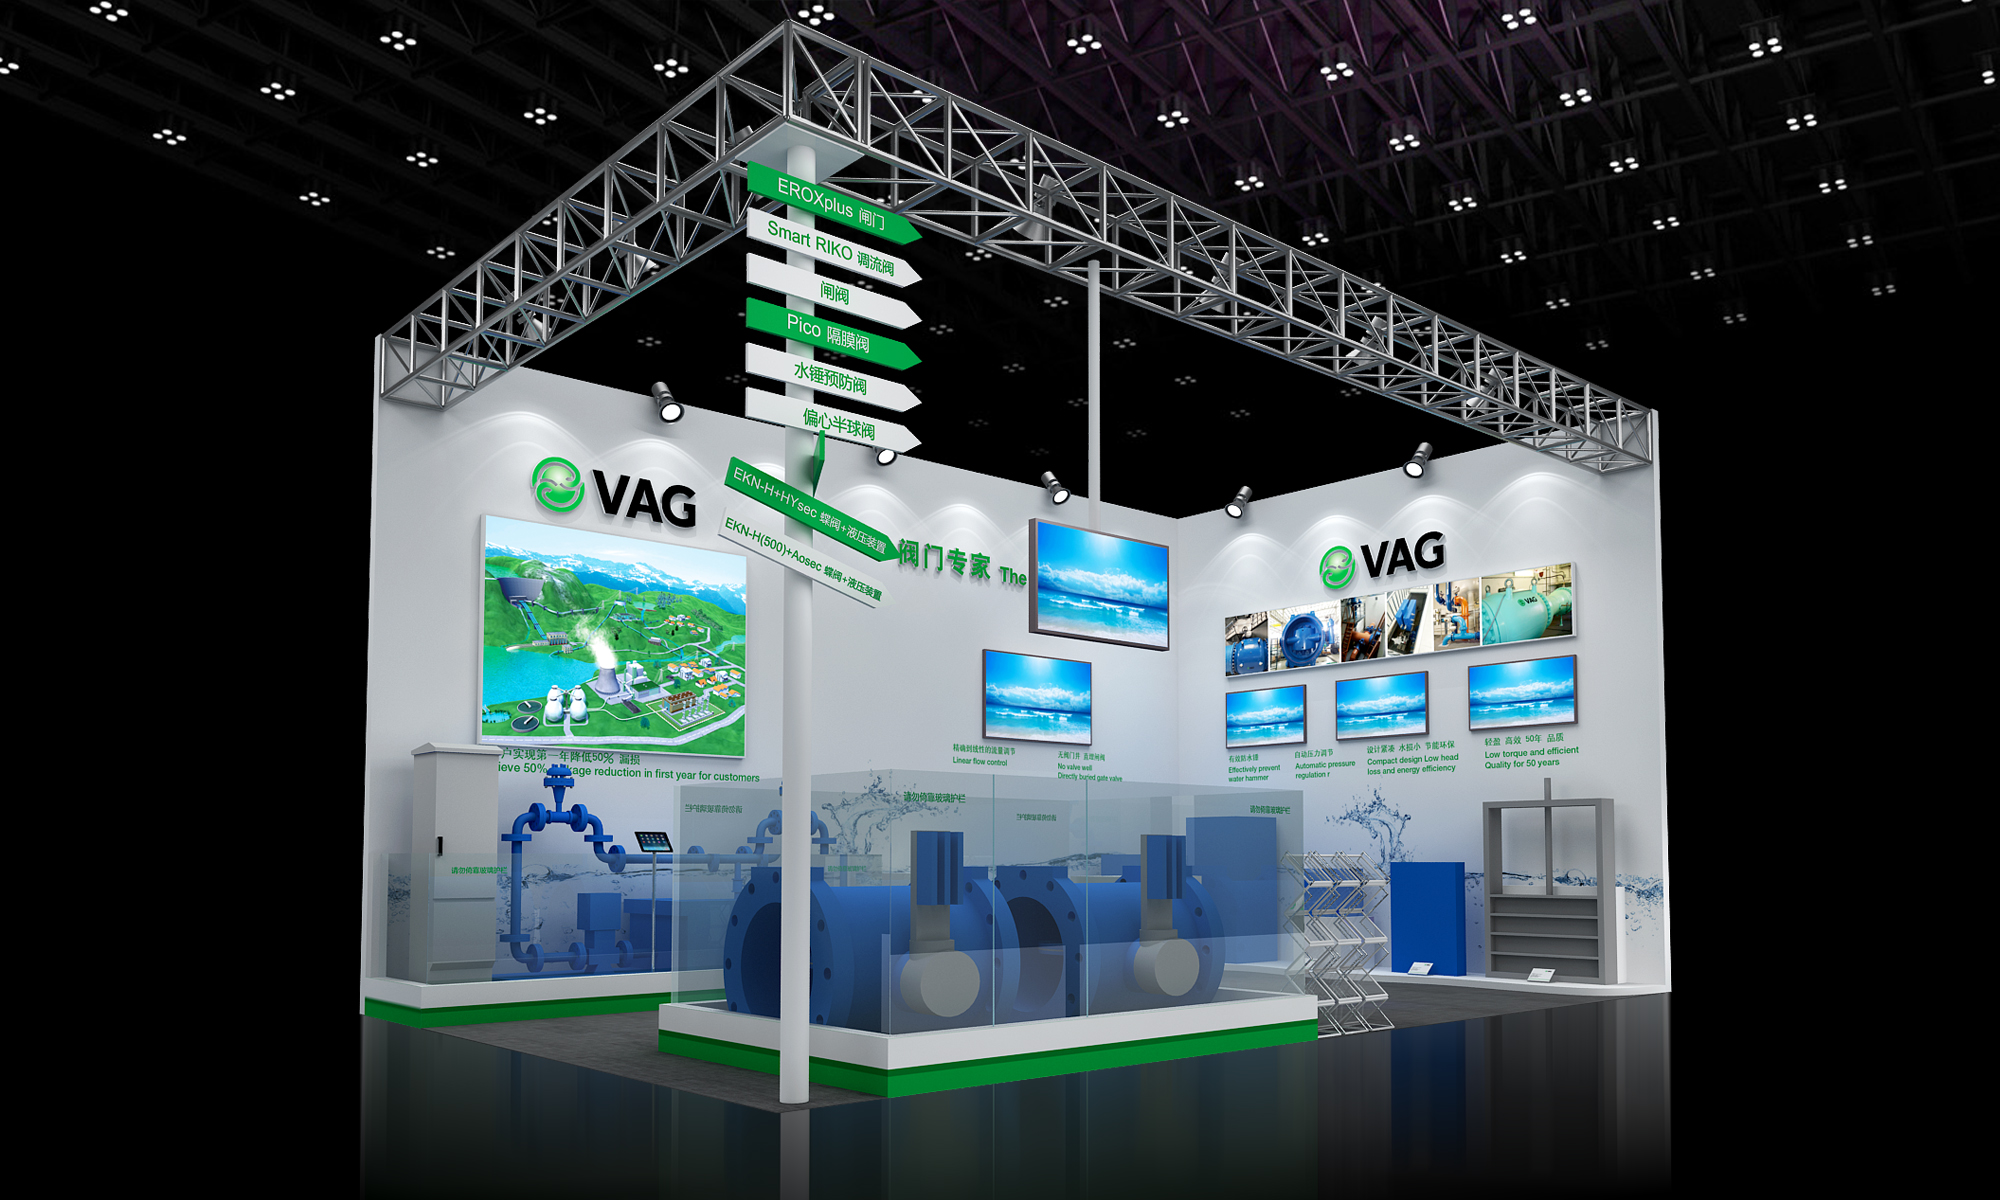 VAG展台设计案例的侧面效果图